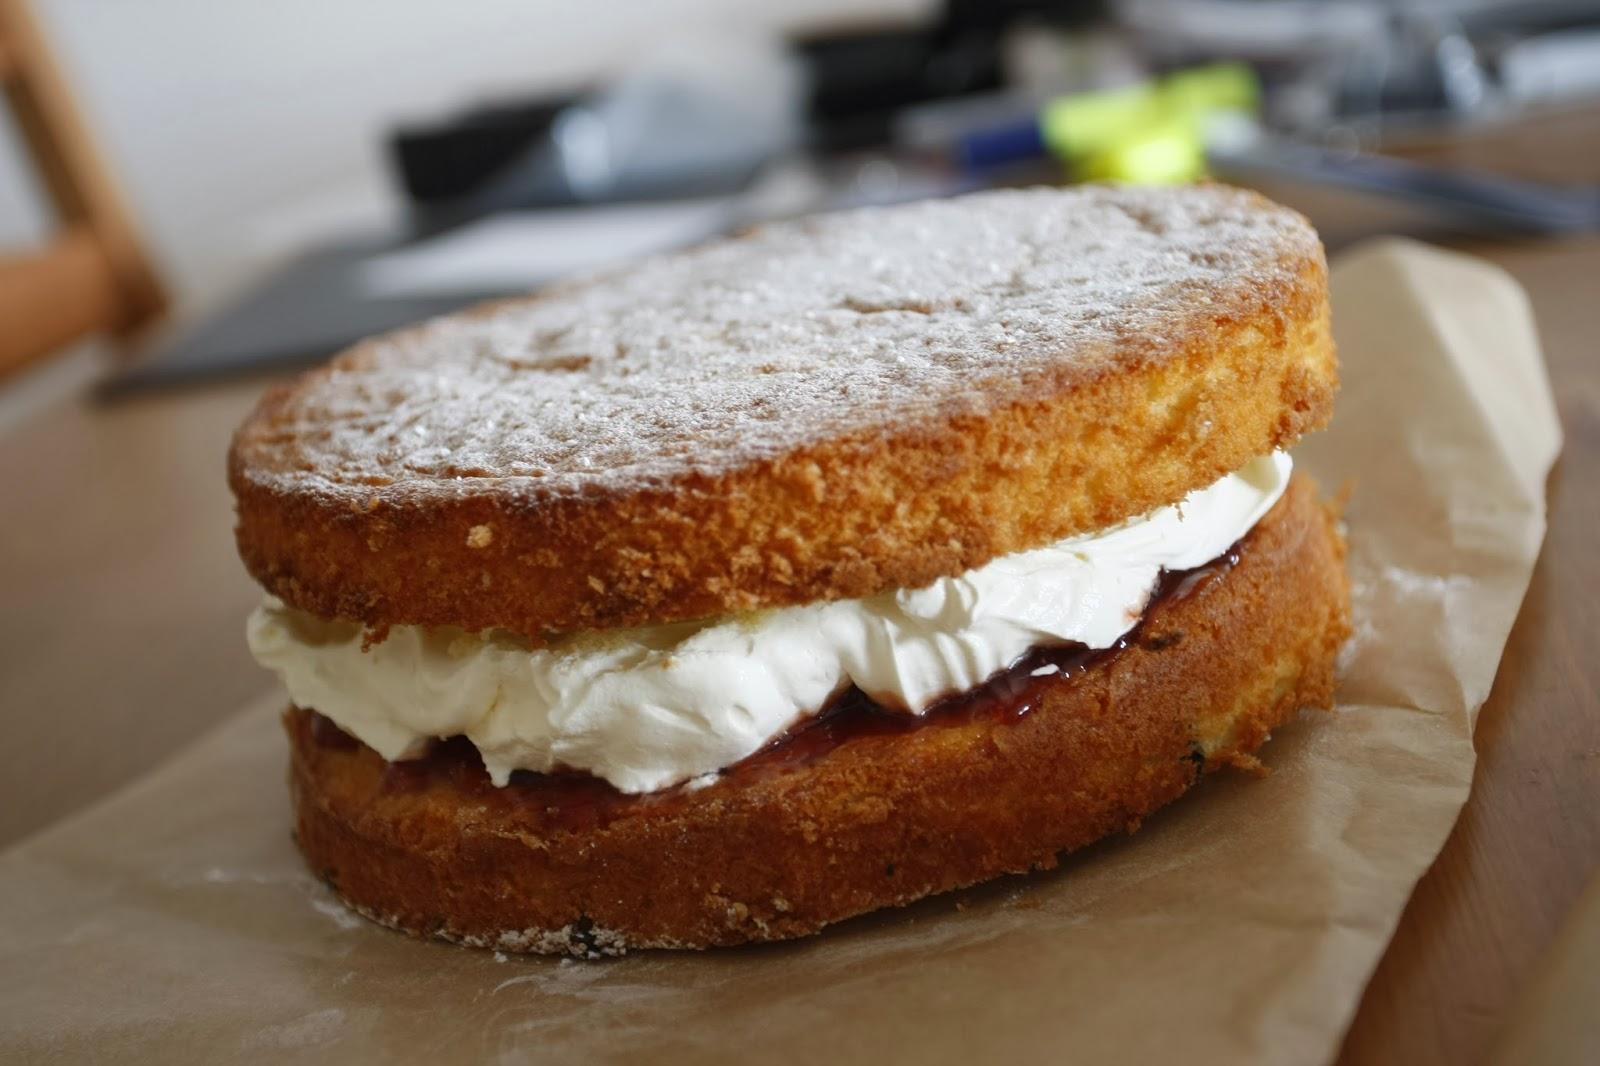 Sponge Cake Vs Regular Cake